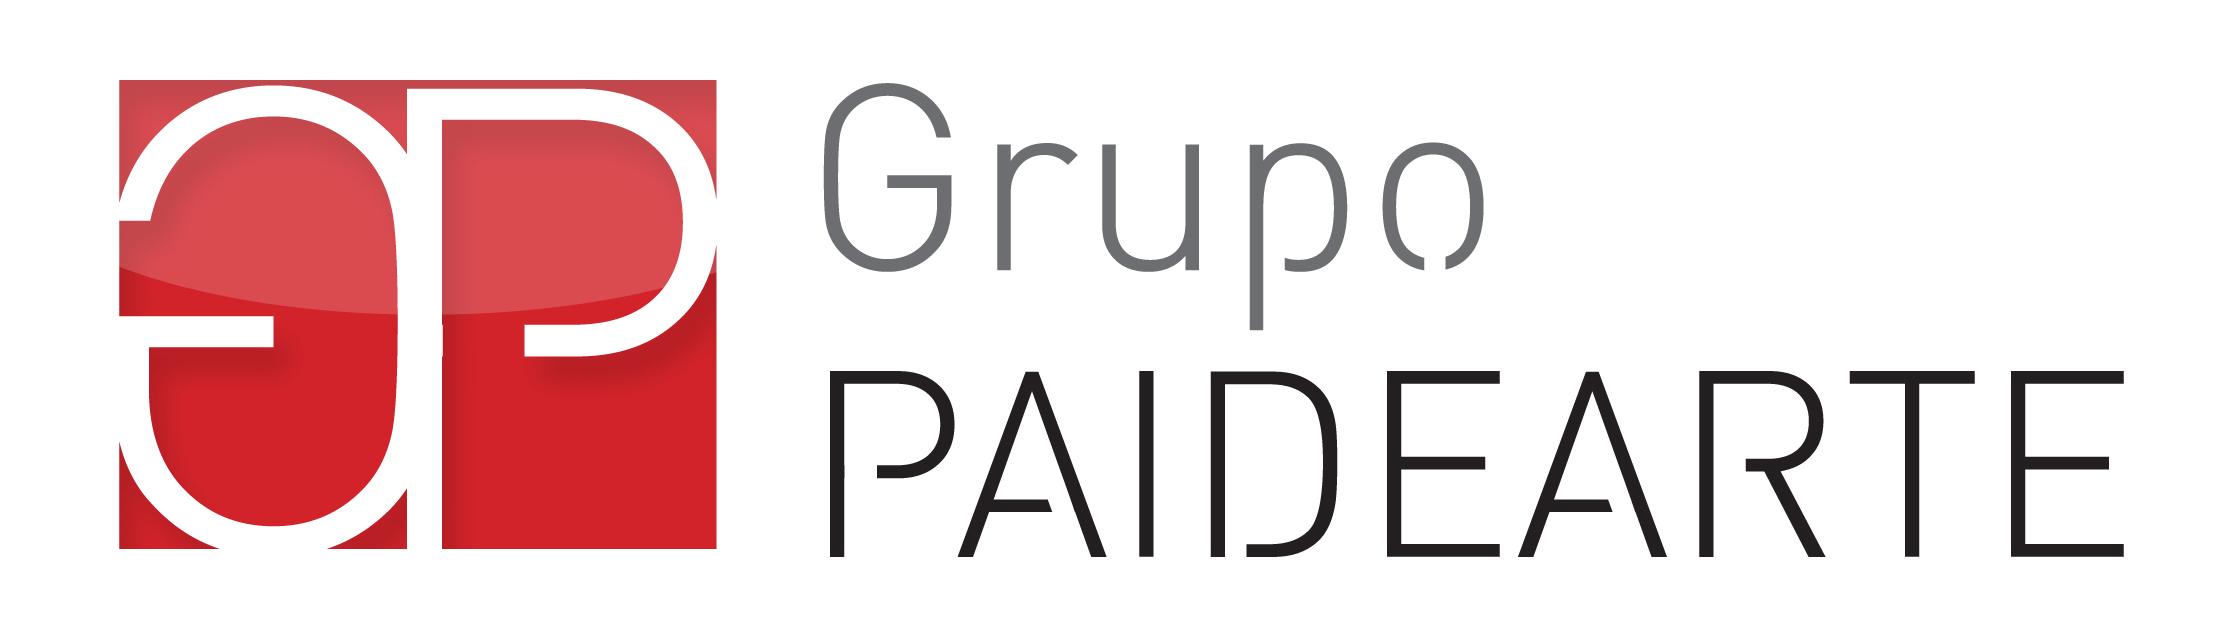 Grupo Paidearte